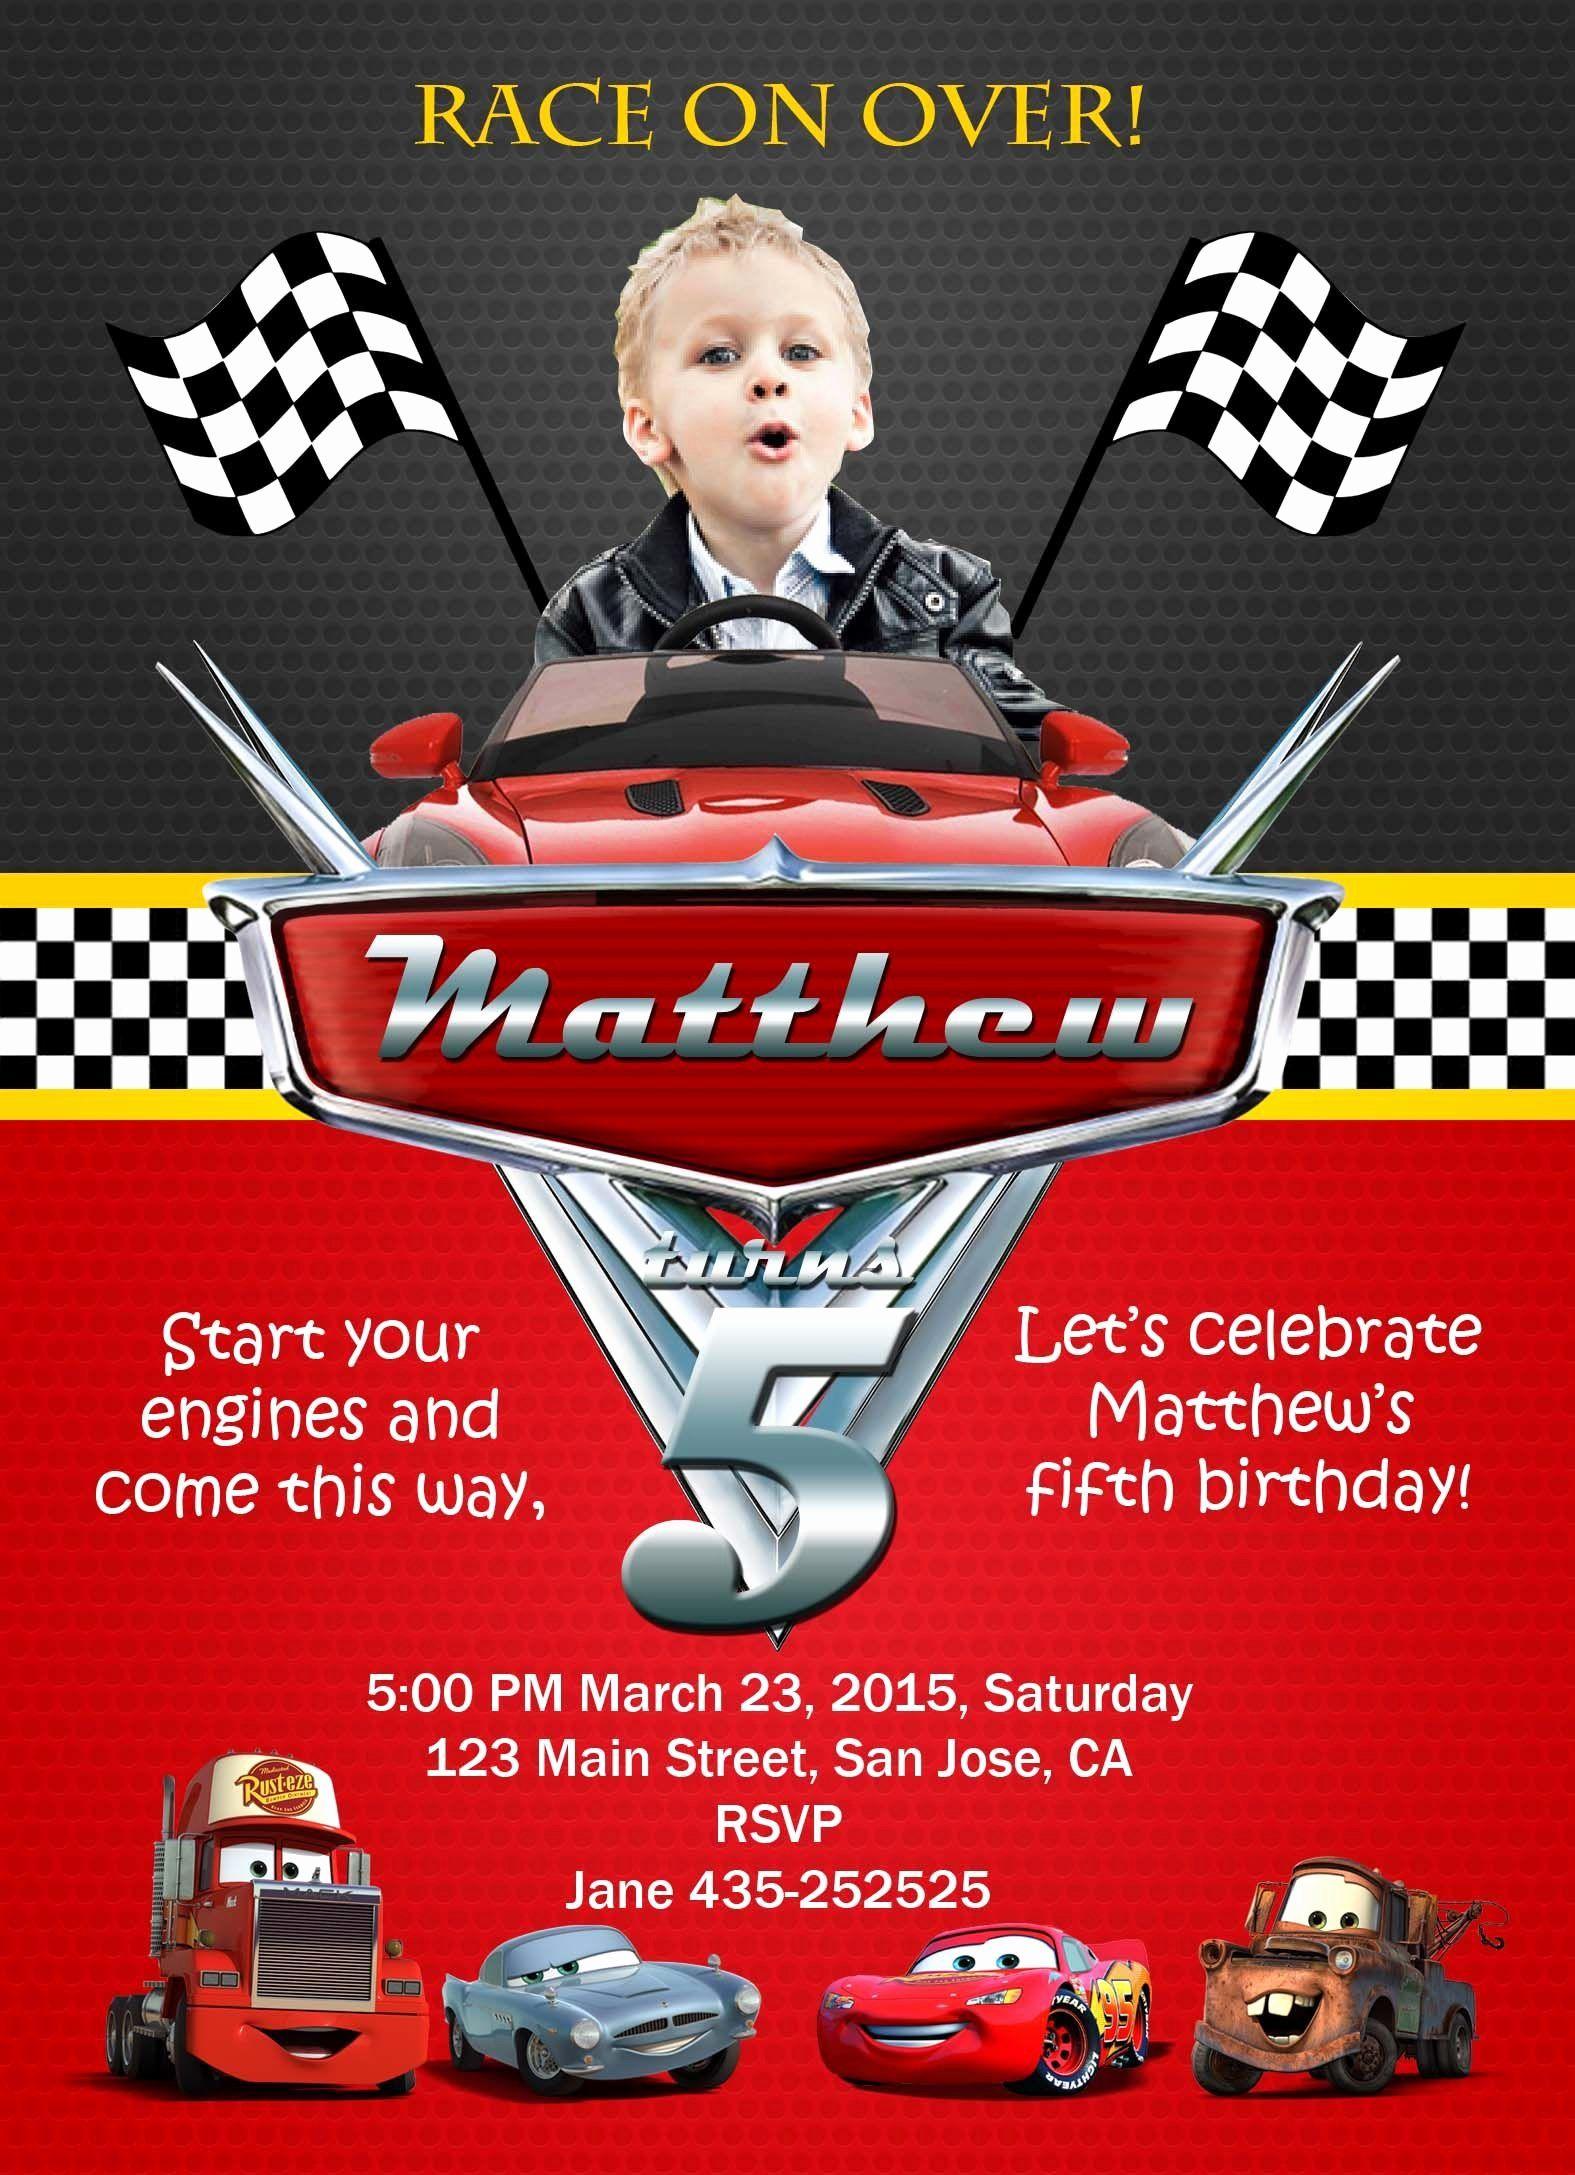 Cars Birthday Invitation Template Lovely Pin By Birthday Invite On Birthday Invitation Cards Cars Birthday Invitations Disney Cars Birthday Car Birthday Theme